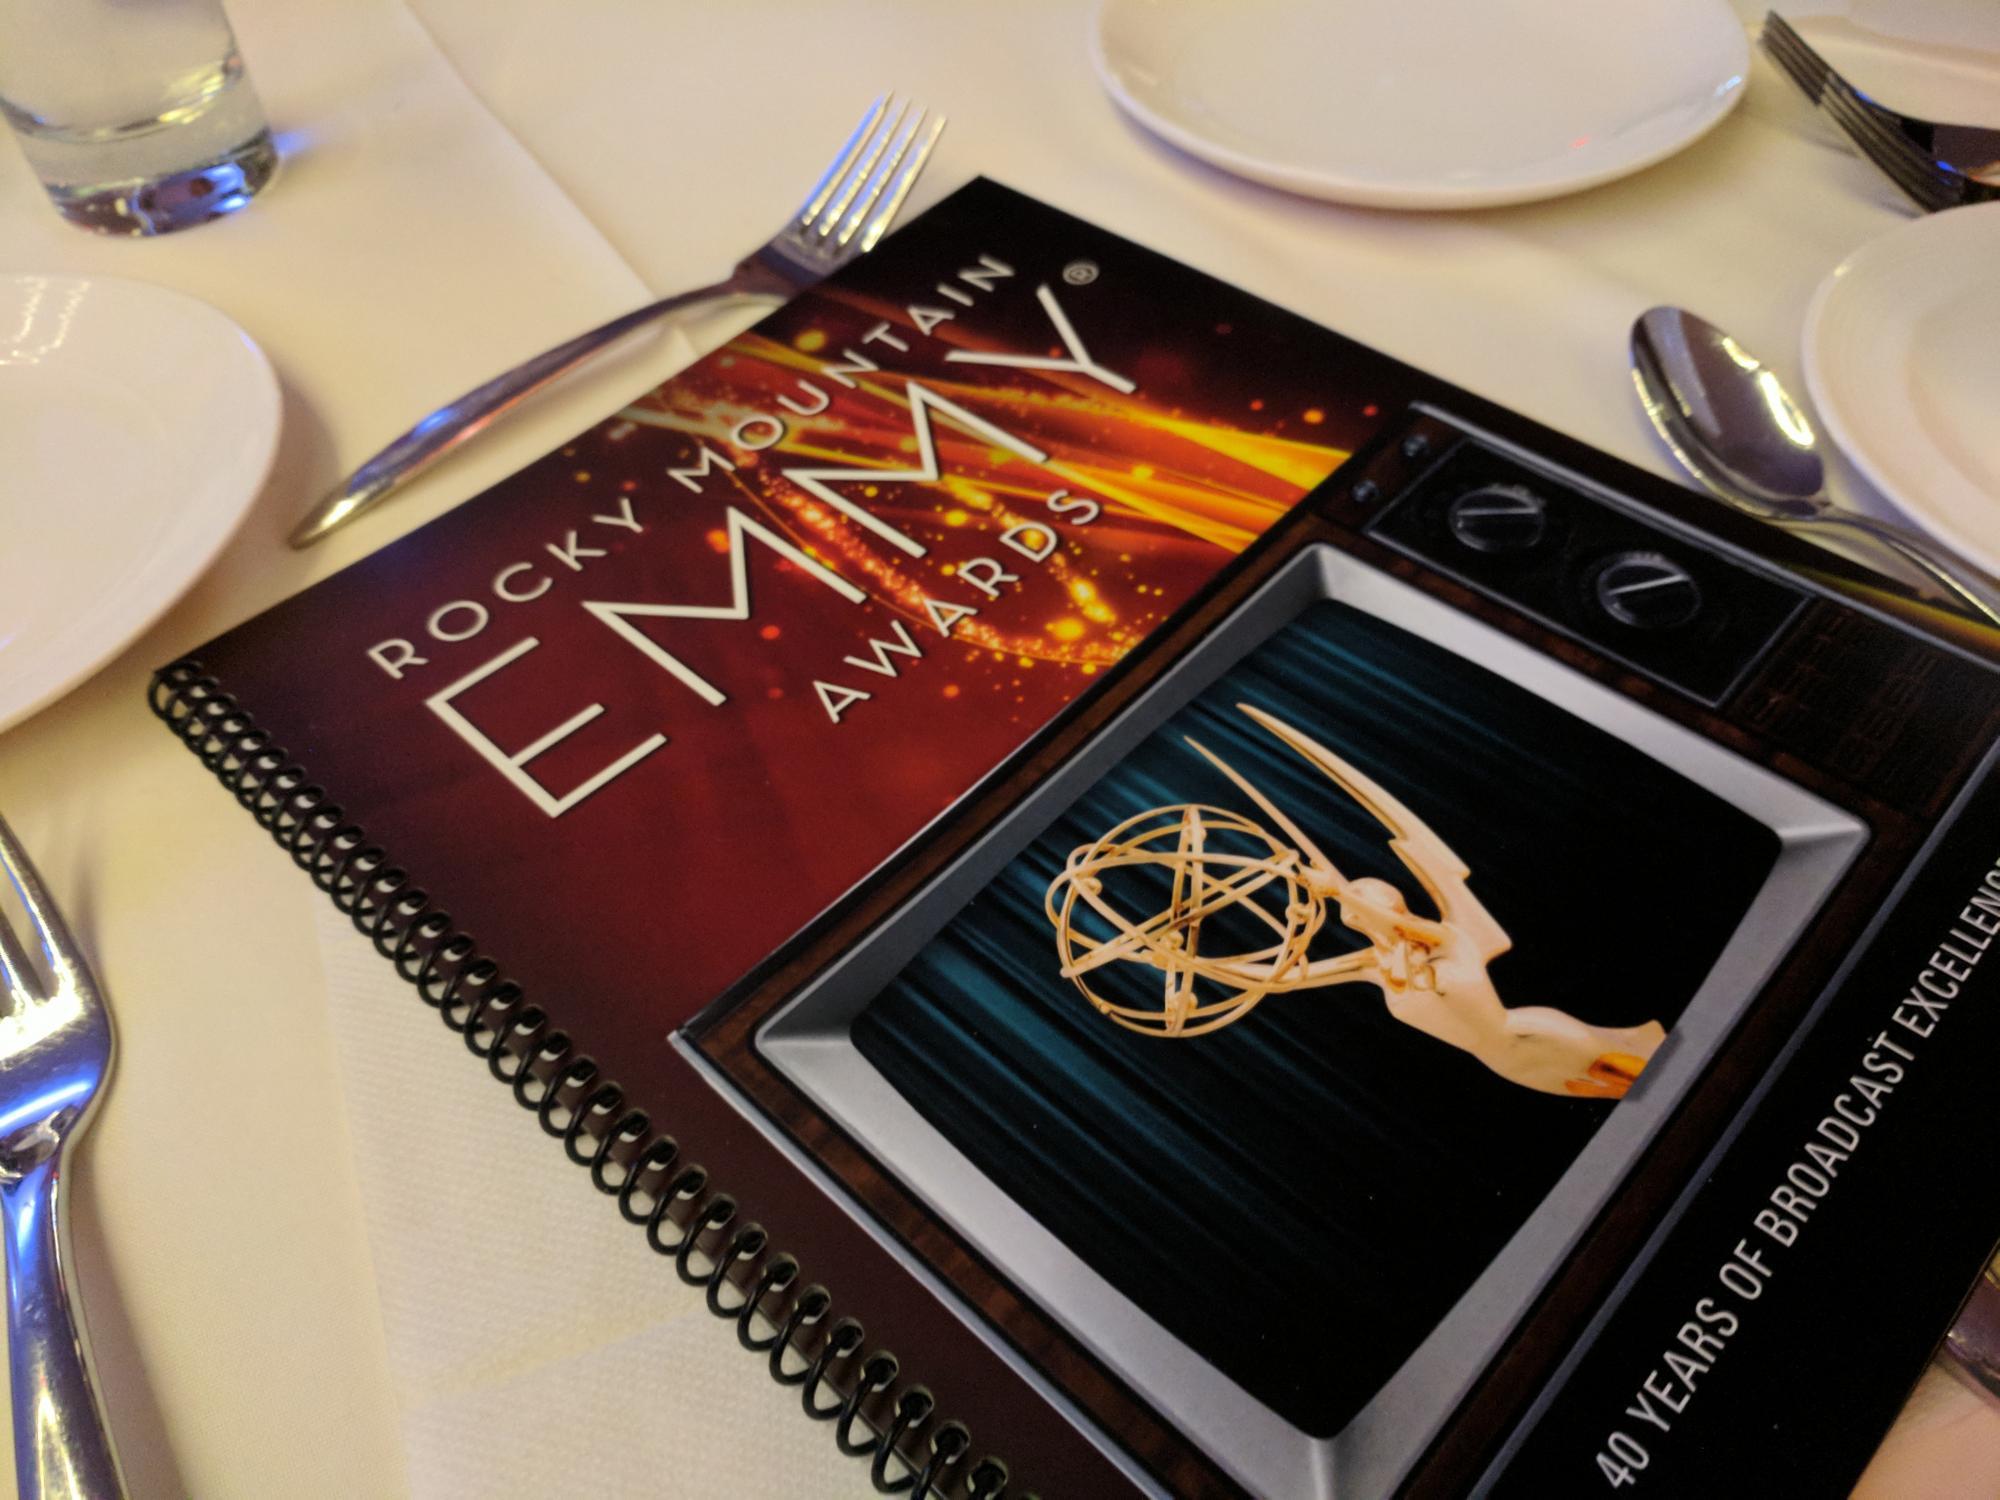 Rocky Mountain Emmy Awards booklet